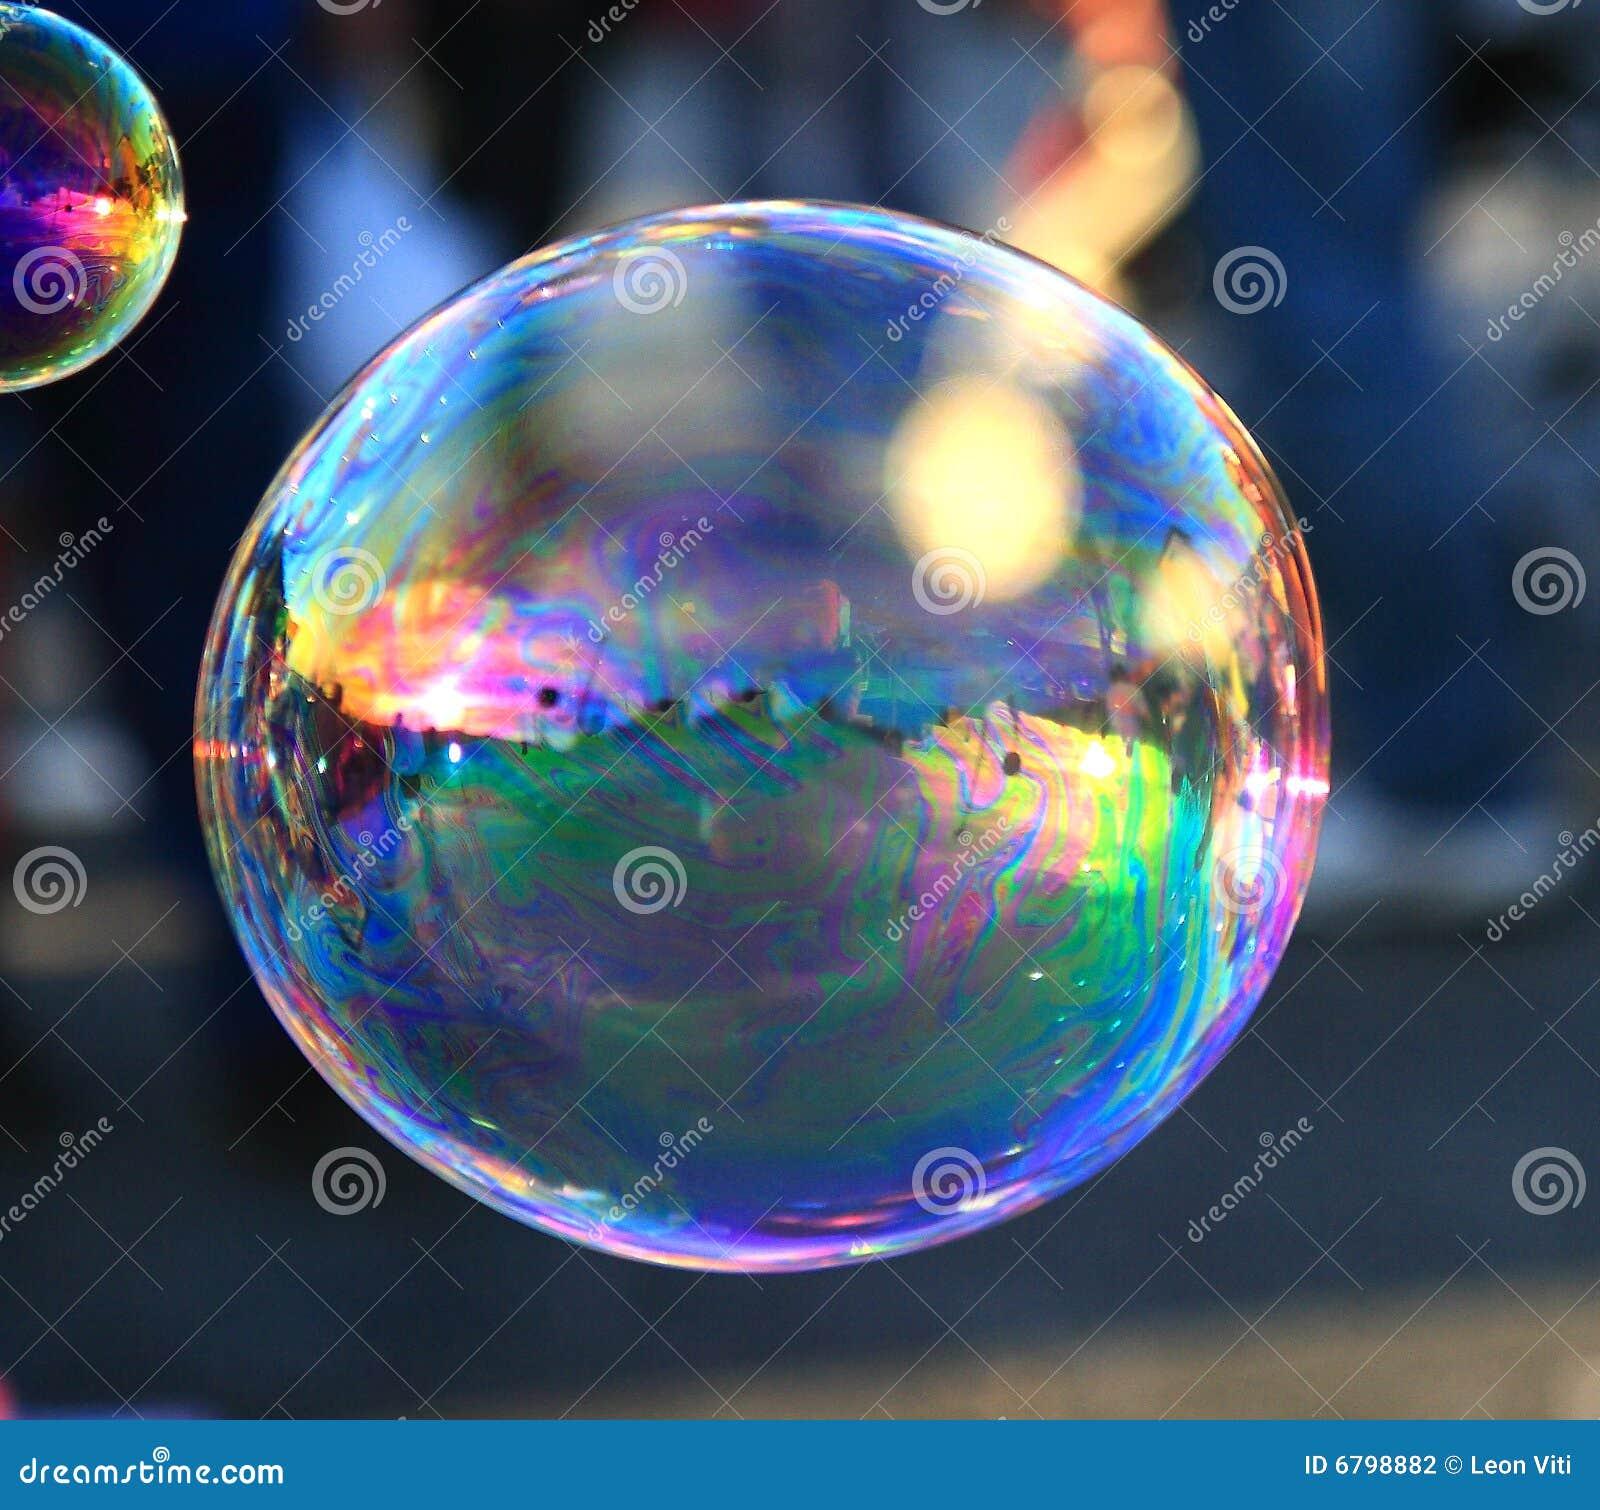 Soap Bubble On Light Ble Background Stock Photo